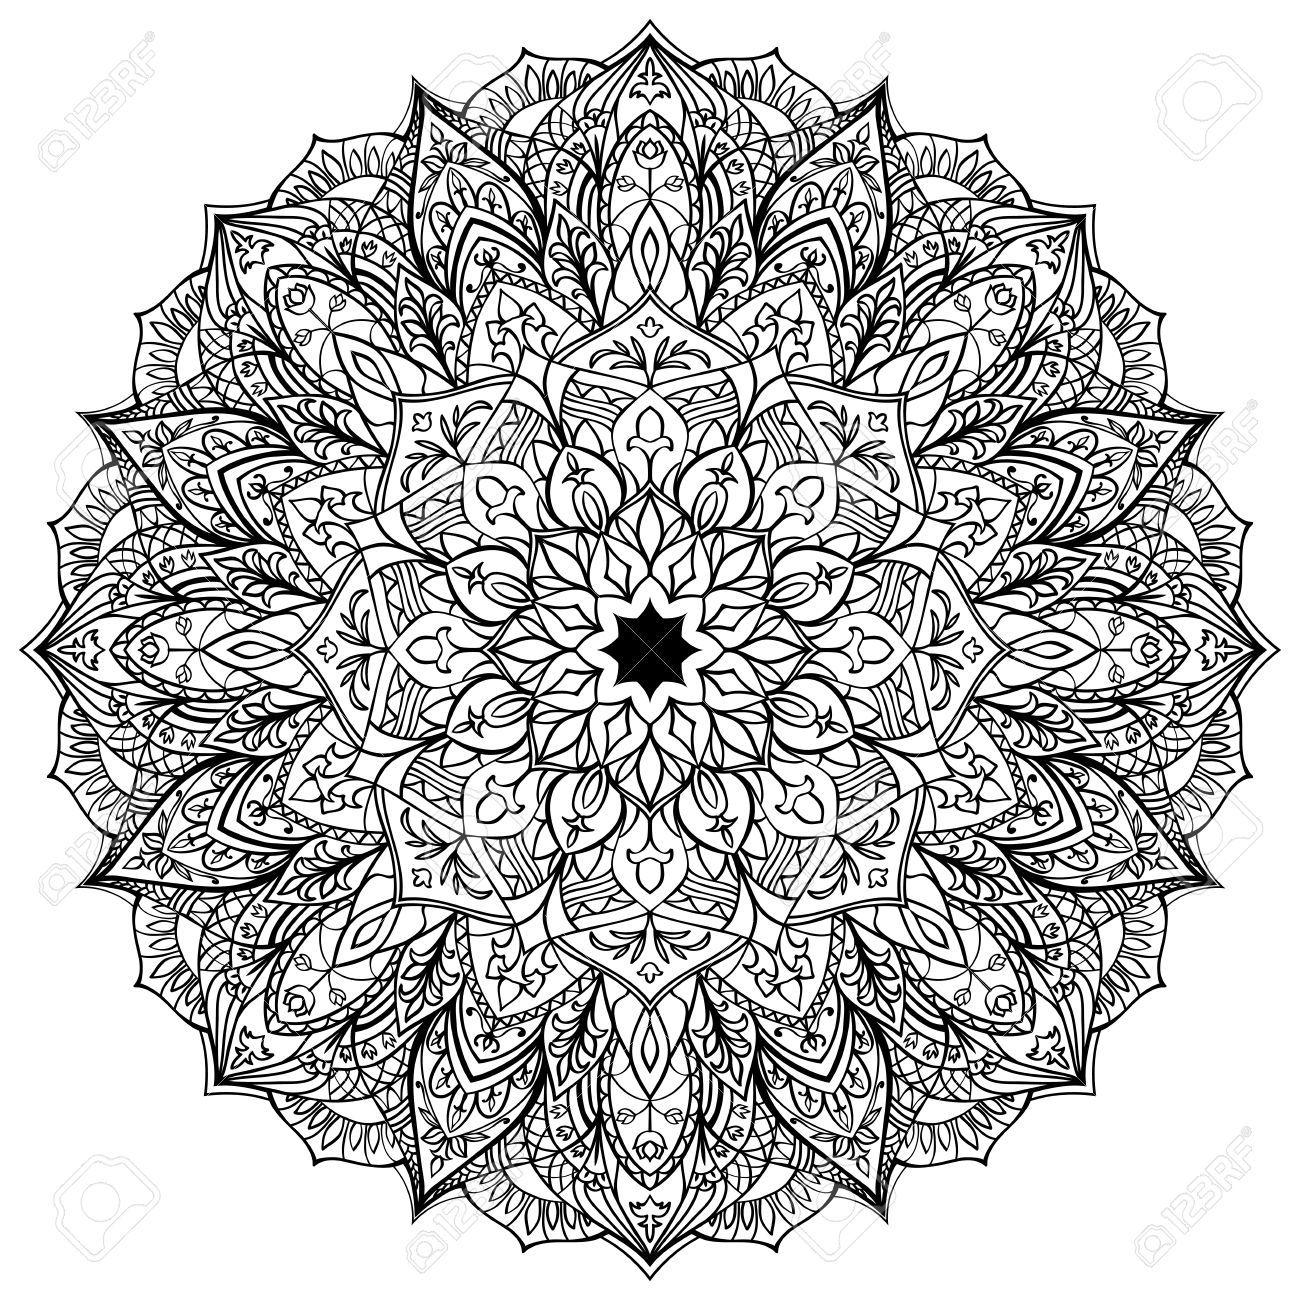 google images mandala coloring pages - photo#18